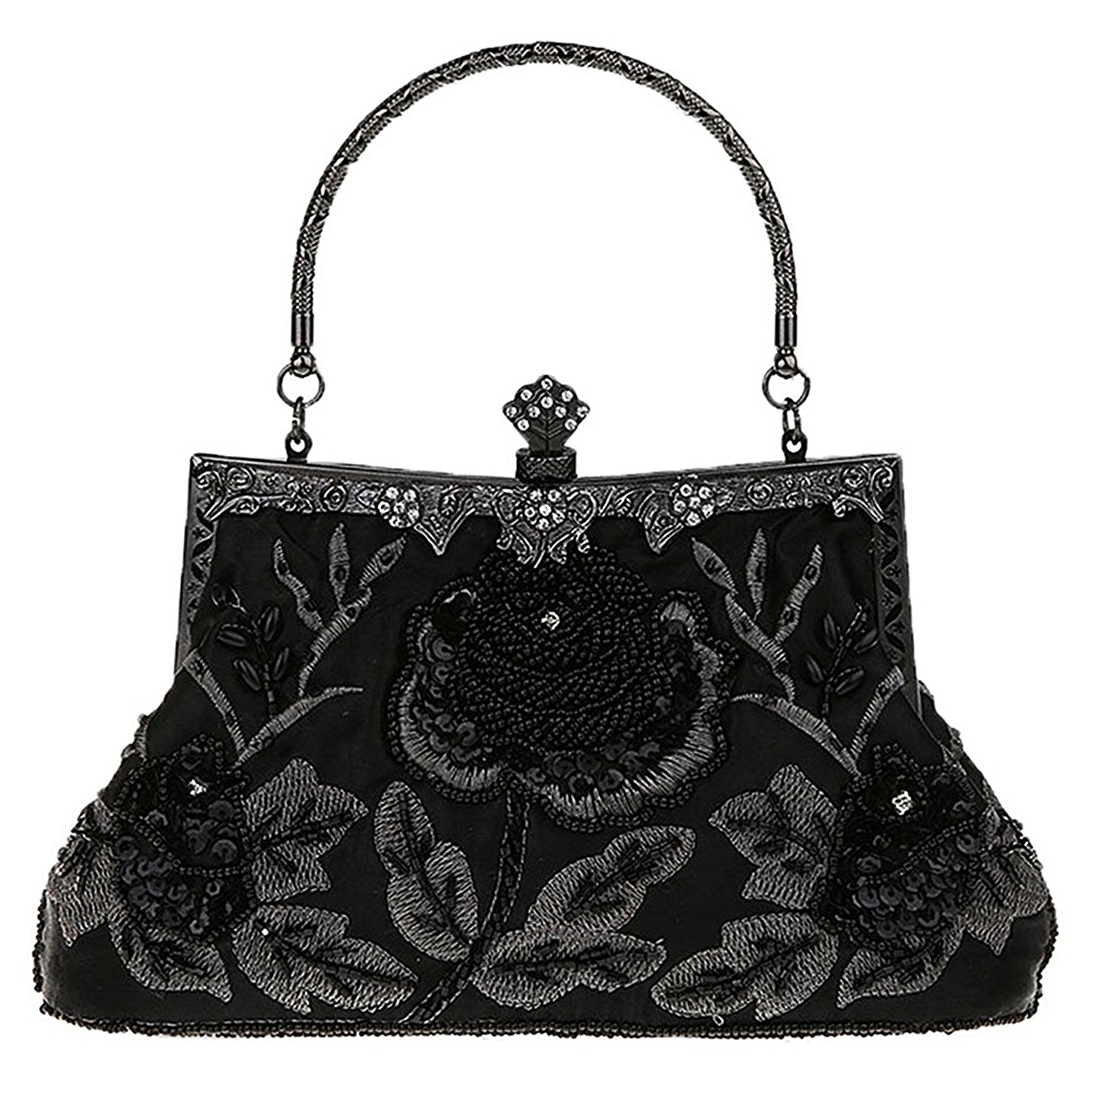 Chic Women Antique Bag Luxury Beaded Rose Evening Purse Clutch Handbag Classic Retro Party Ladies Soft Satin Bag 2018 New Women